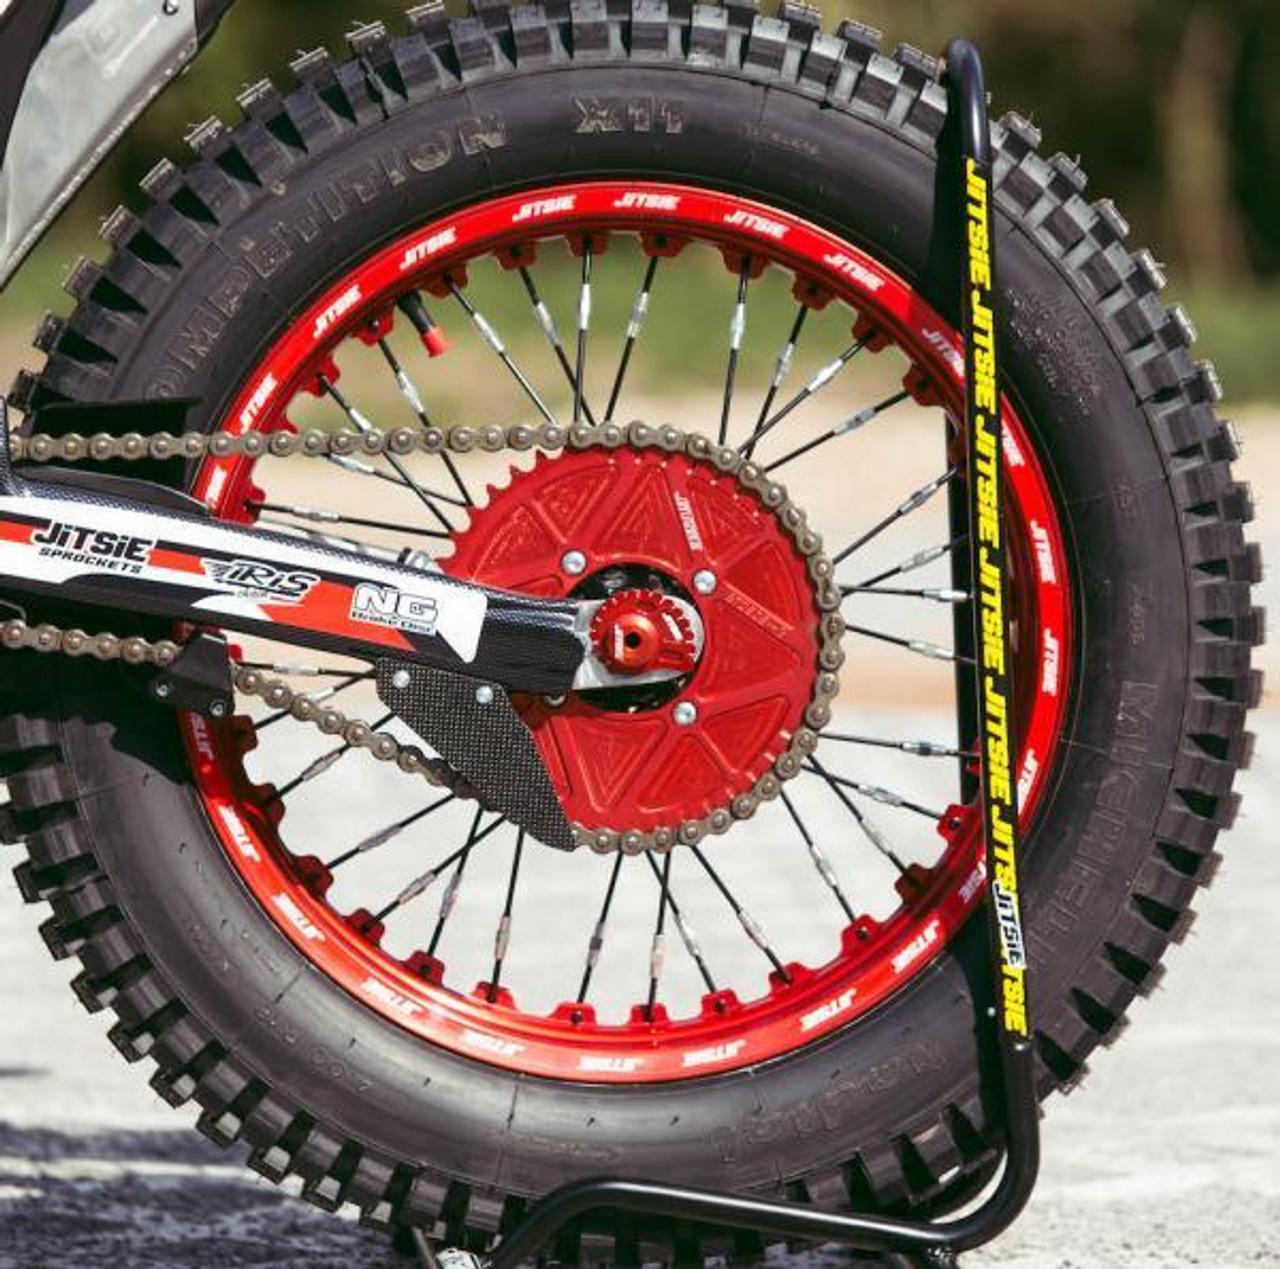 Bike stand,black, with wheel